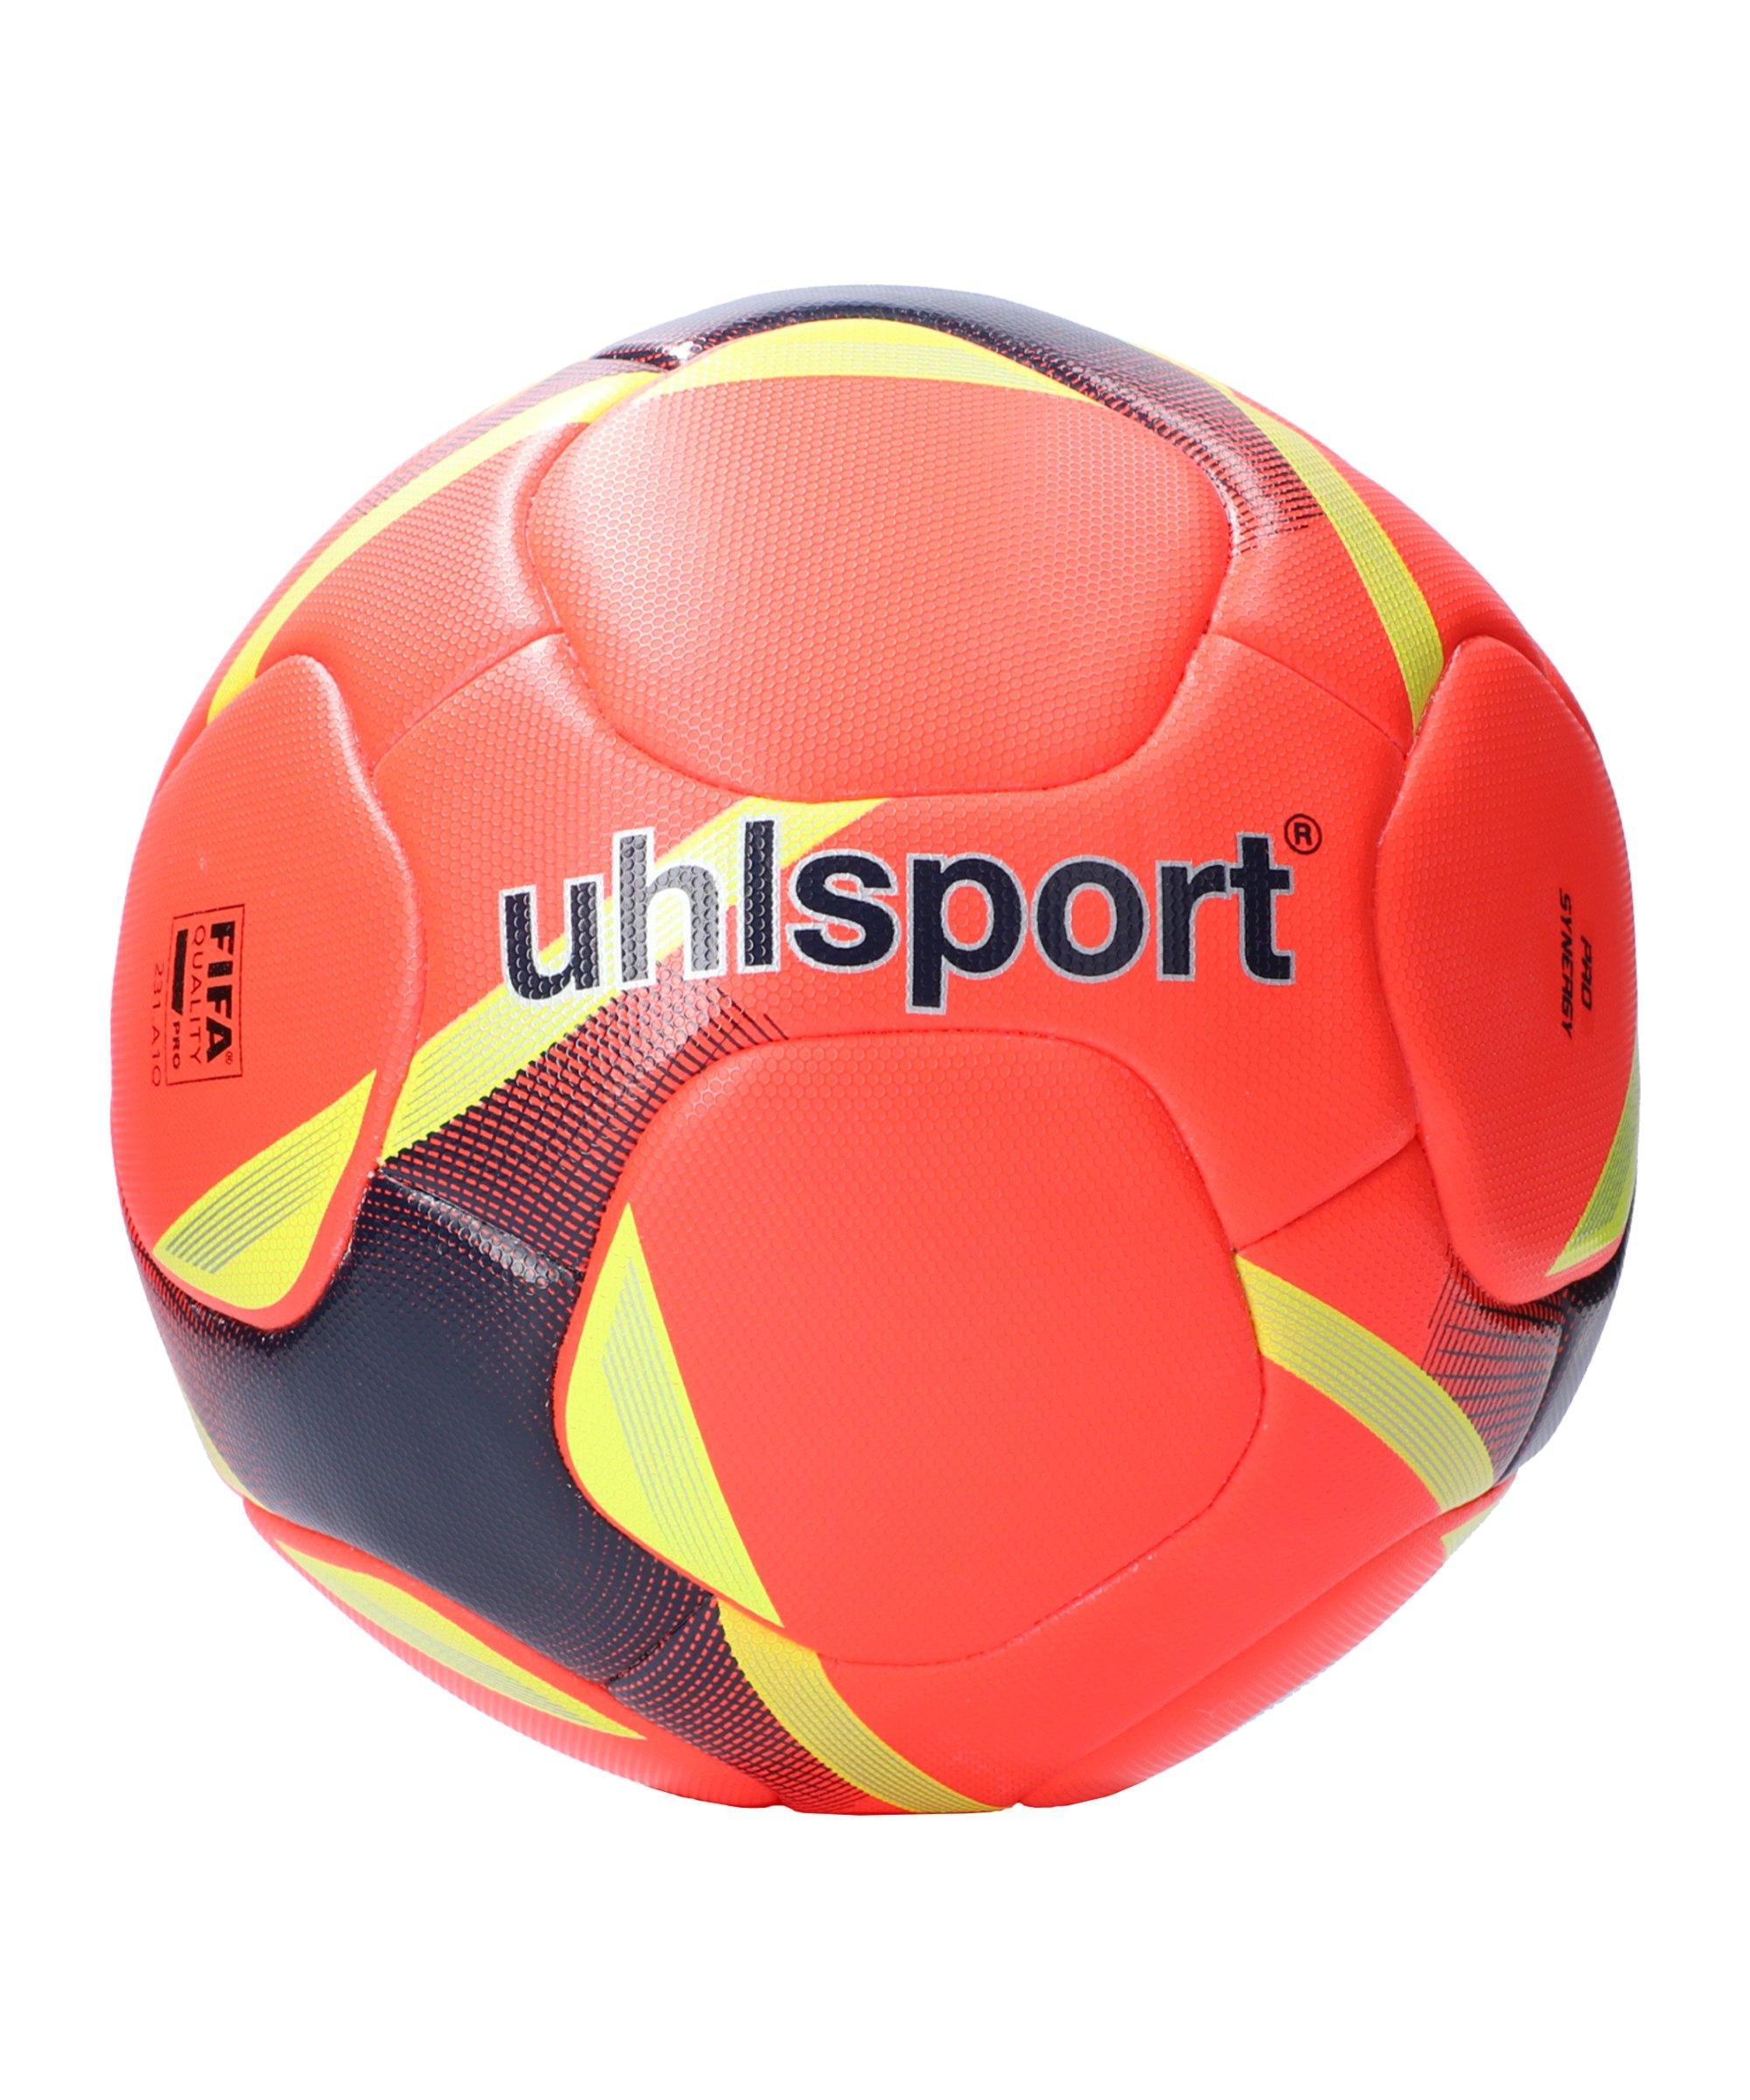 Uhlsport Infinity Synergy Pro 3.0 Fussball F02 - rot